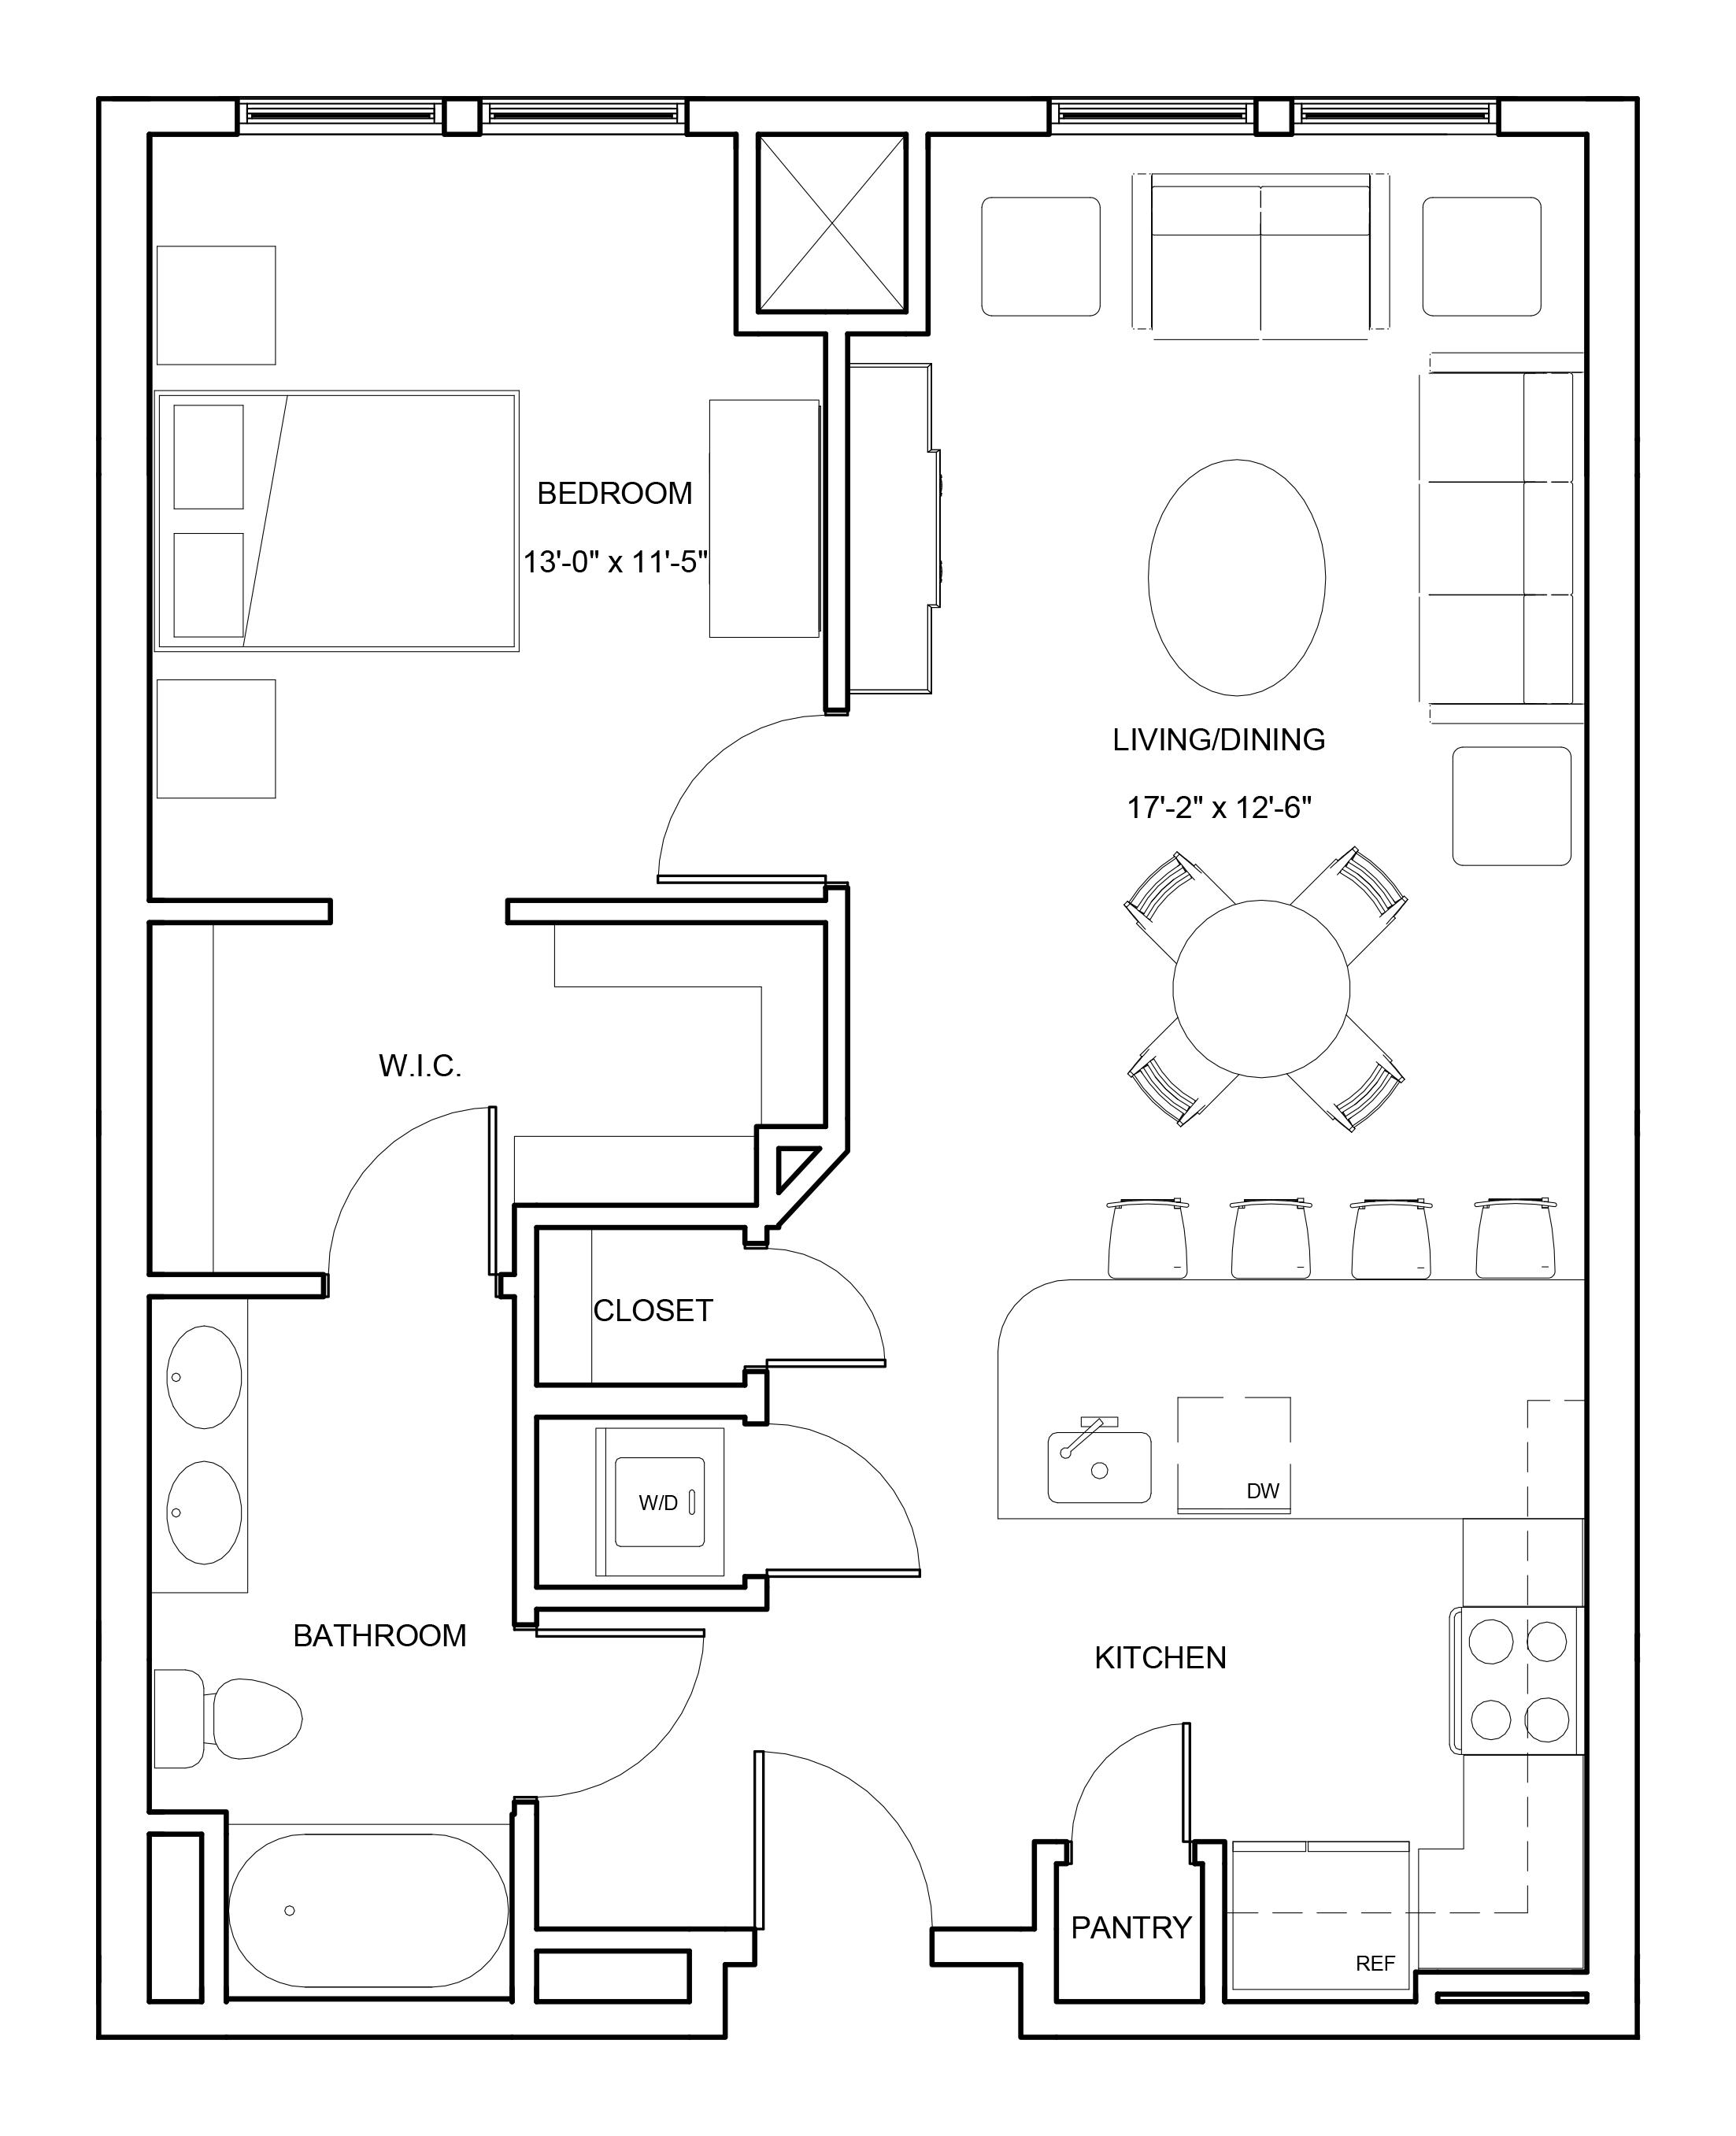 P0663804 a3 2 floorplan